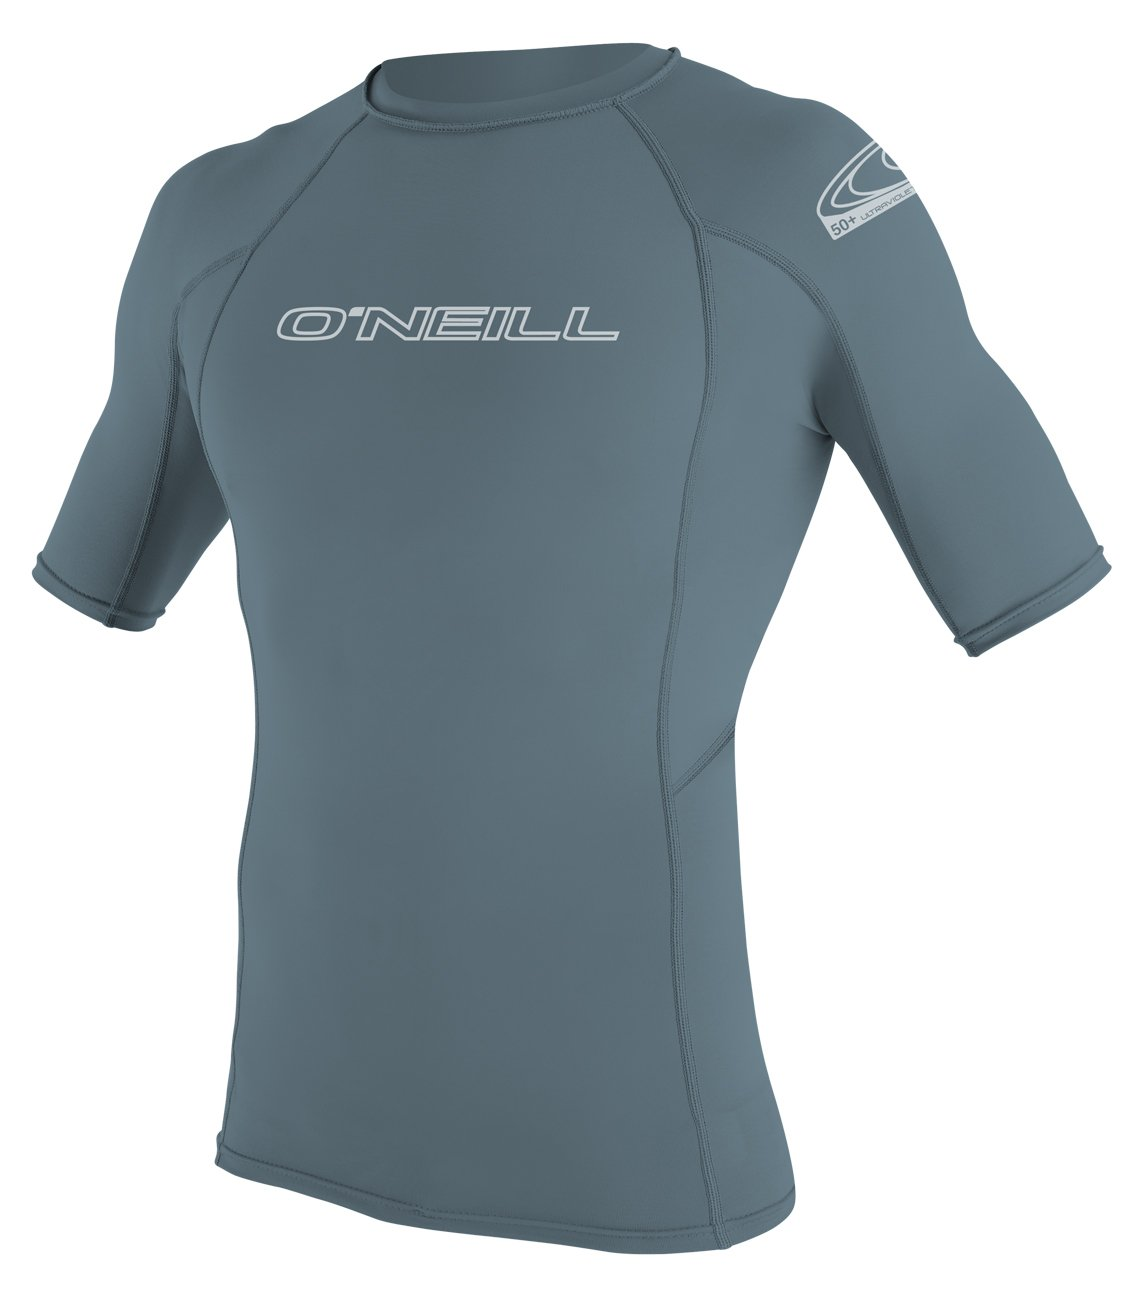 O'Neill Wetsuits Men's Basic Skins UPF 50+ Short Sleeve Rash Guard, Dusty Blue, Small